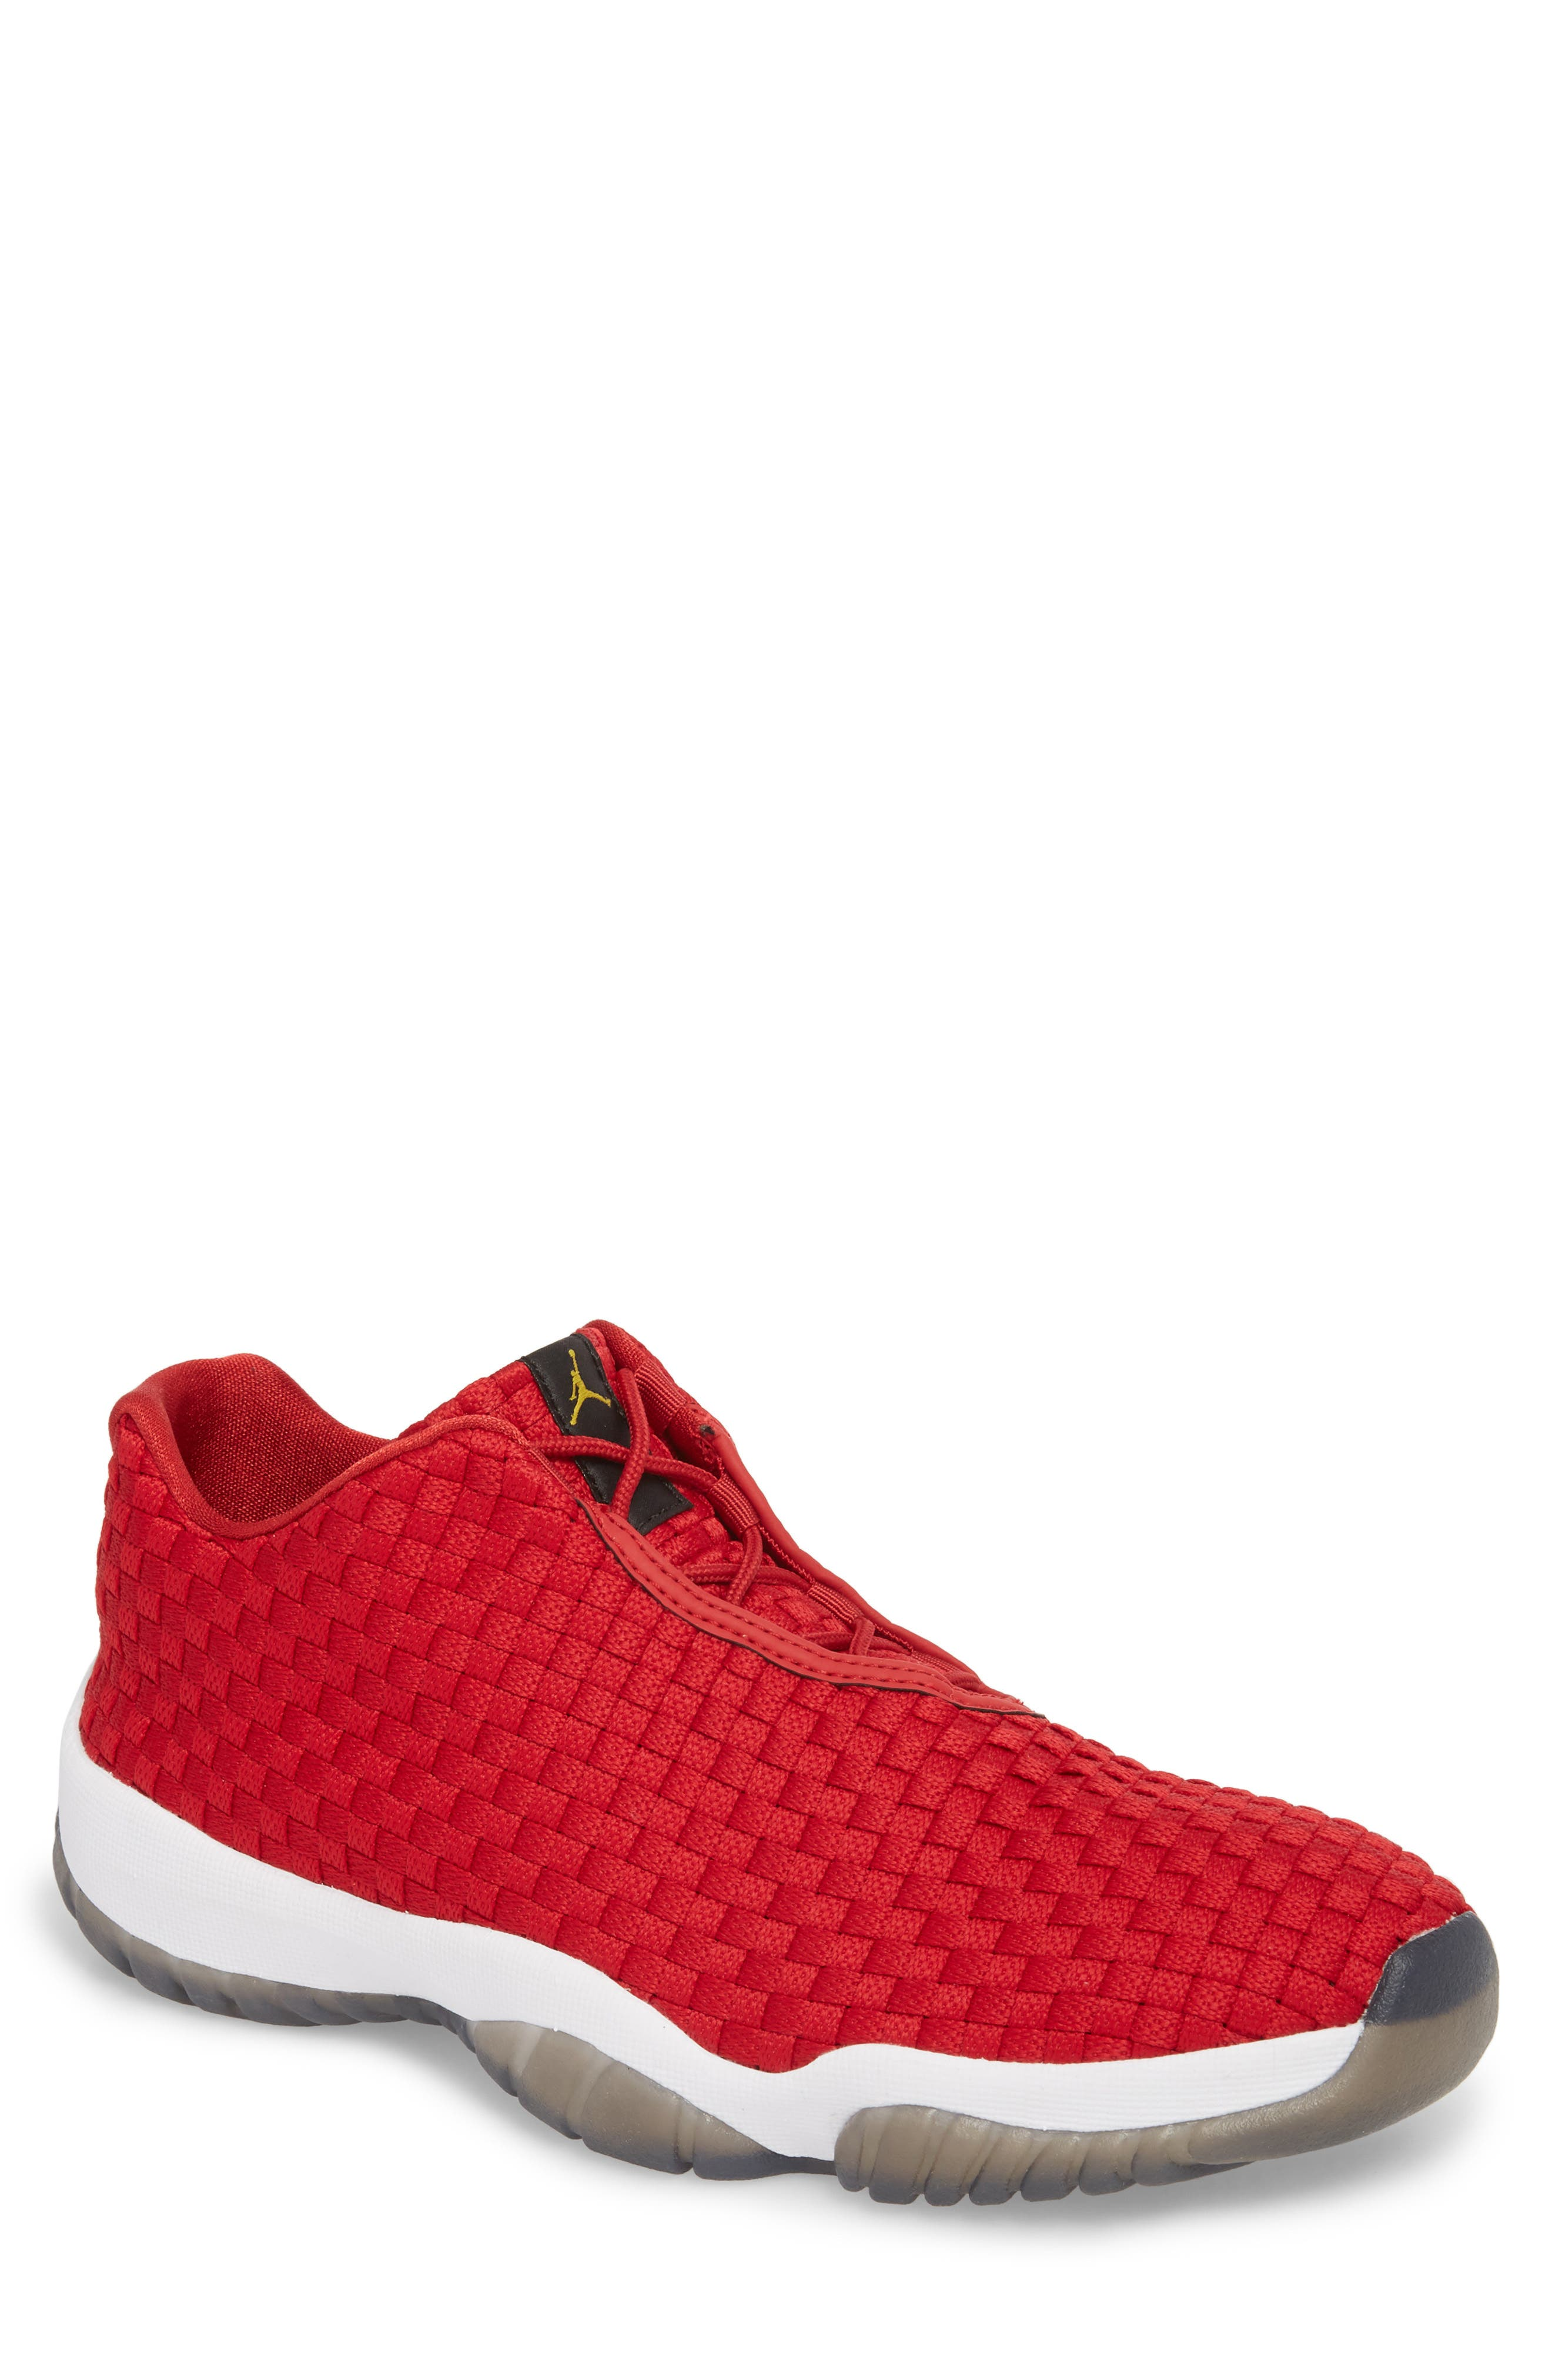 Air Jordan Future Woven Sneaker,                         Main,                         color, Gym Red/ White/ Black